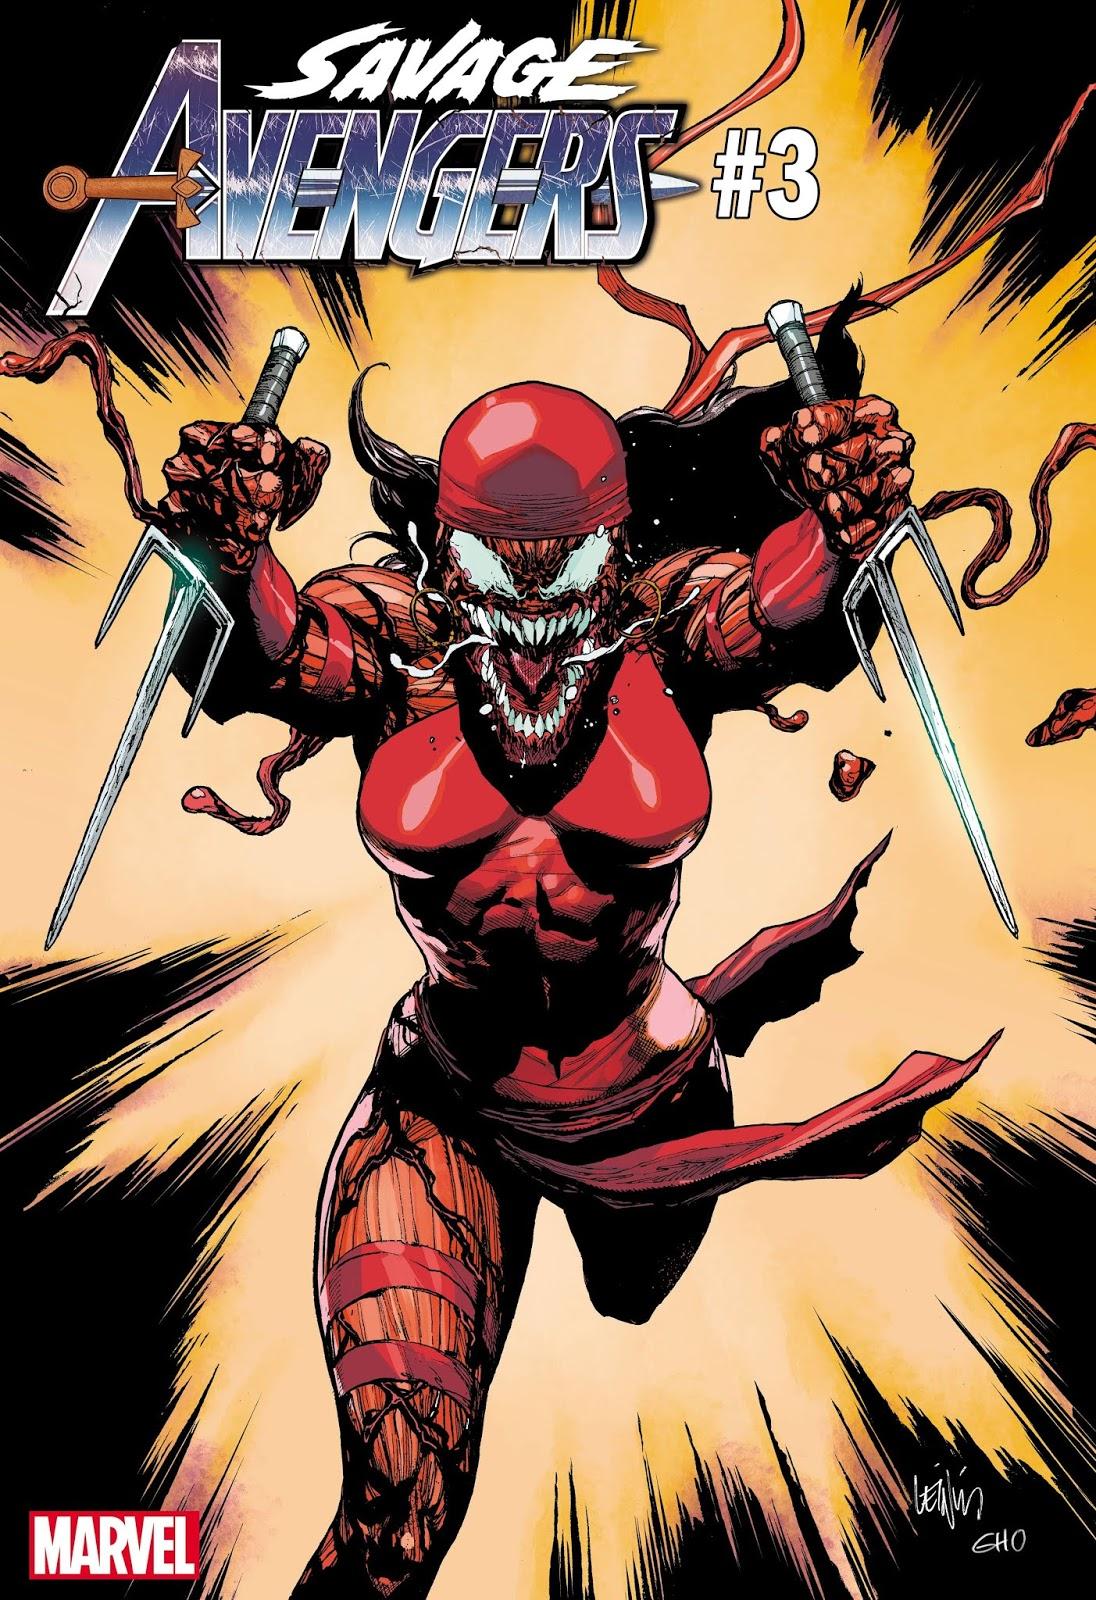 Lim 2099 Variante Hickman Marvel 2019 quase perfeito X-men #2 Capa principal Yu